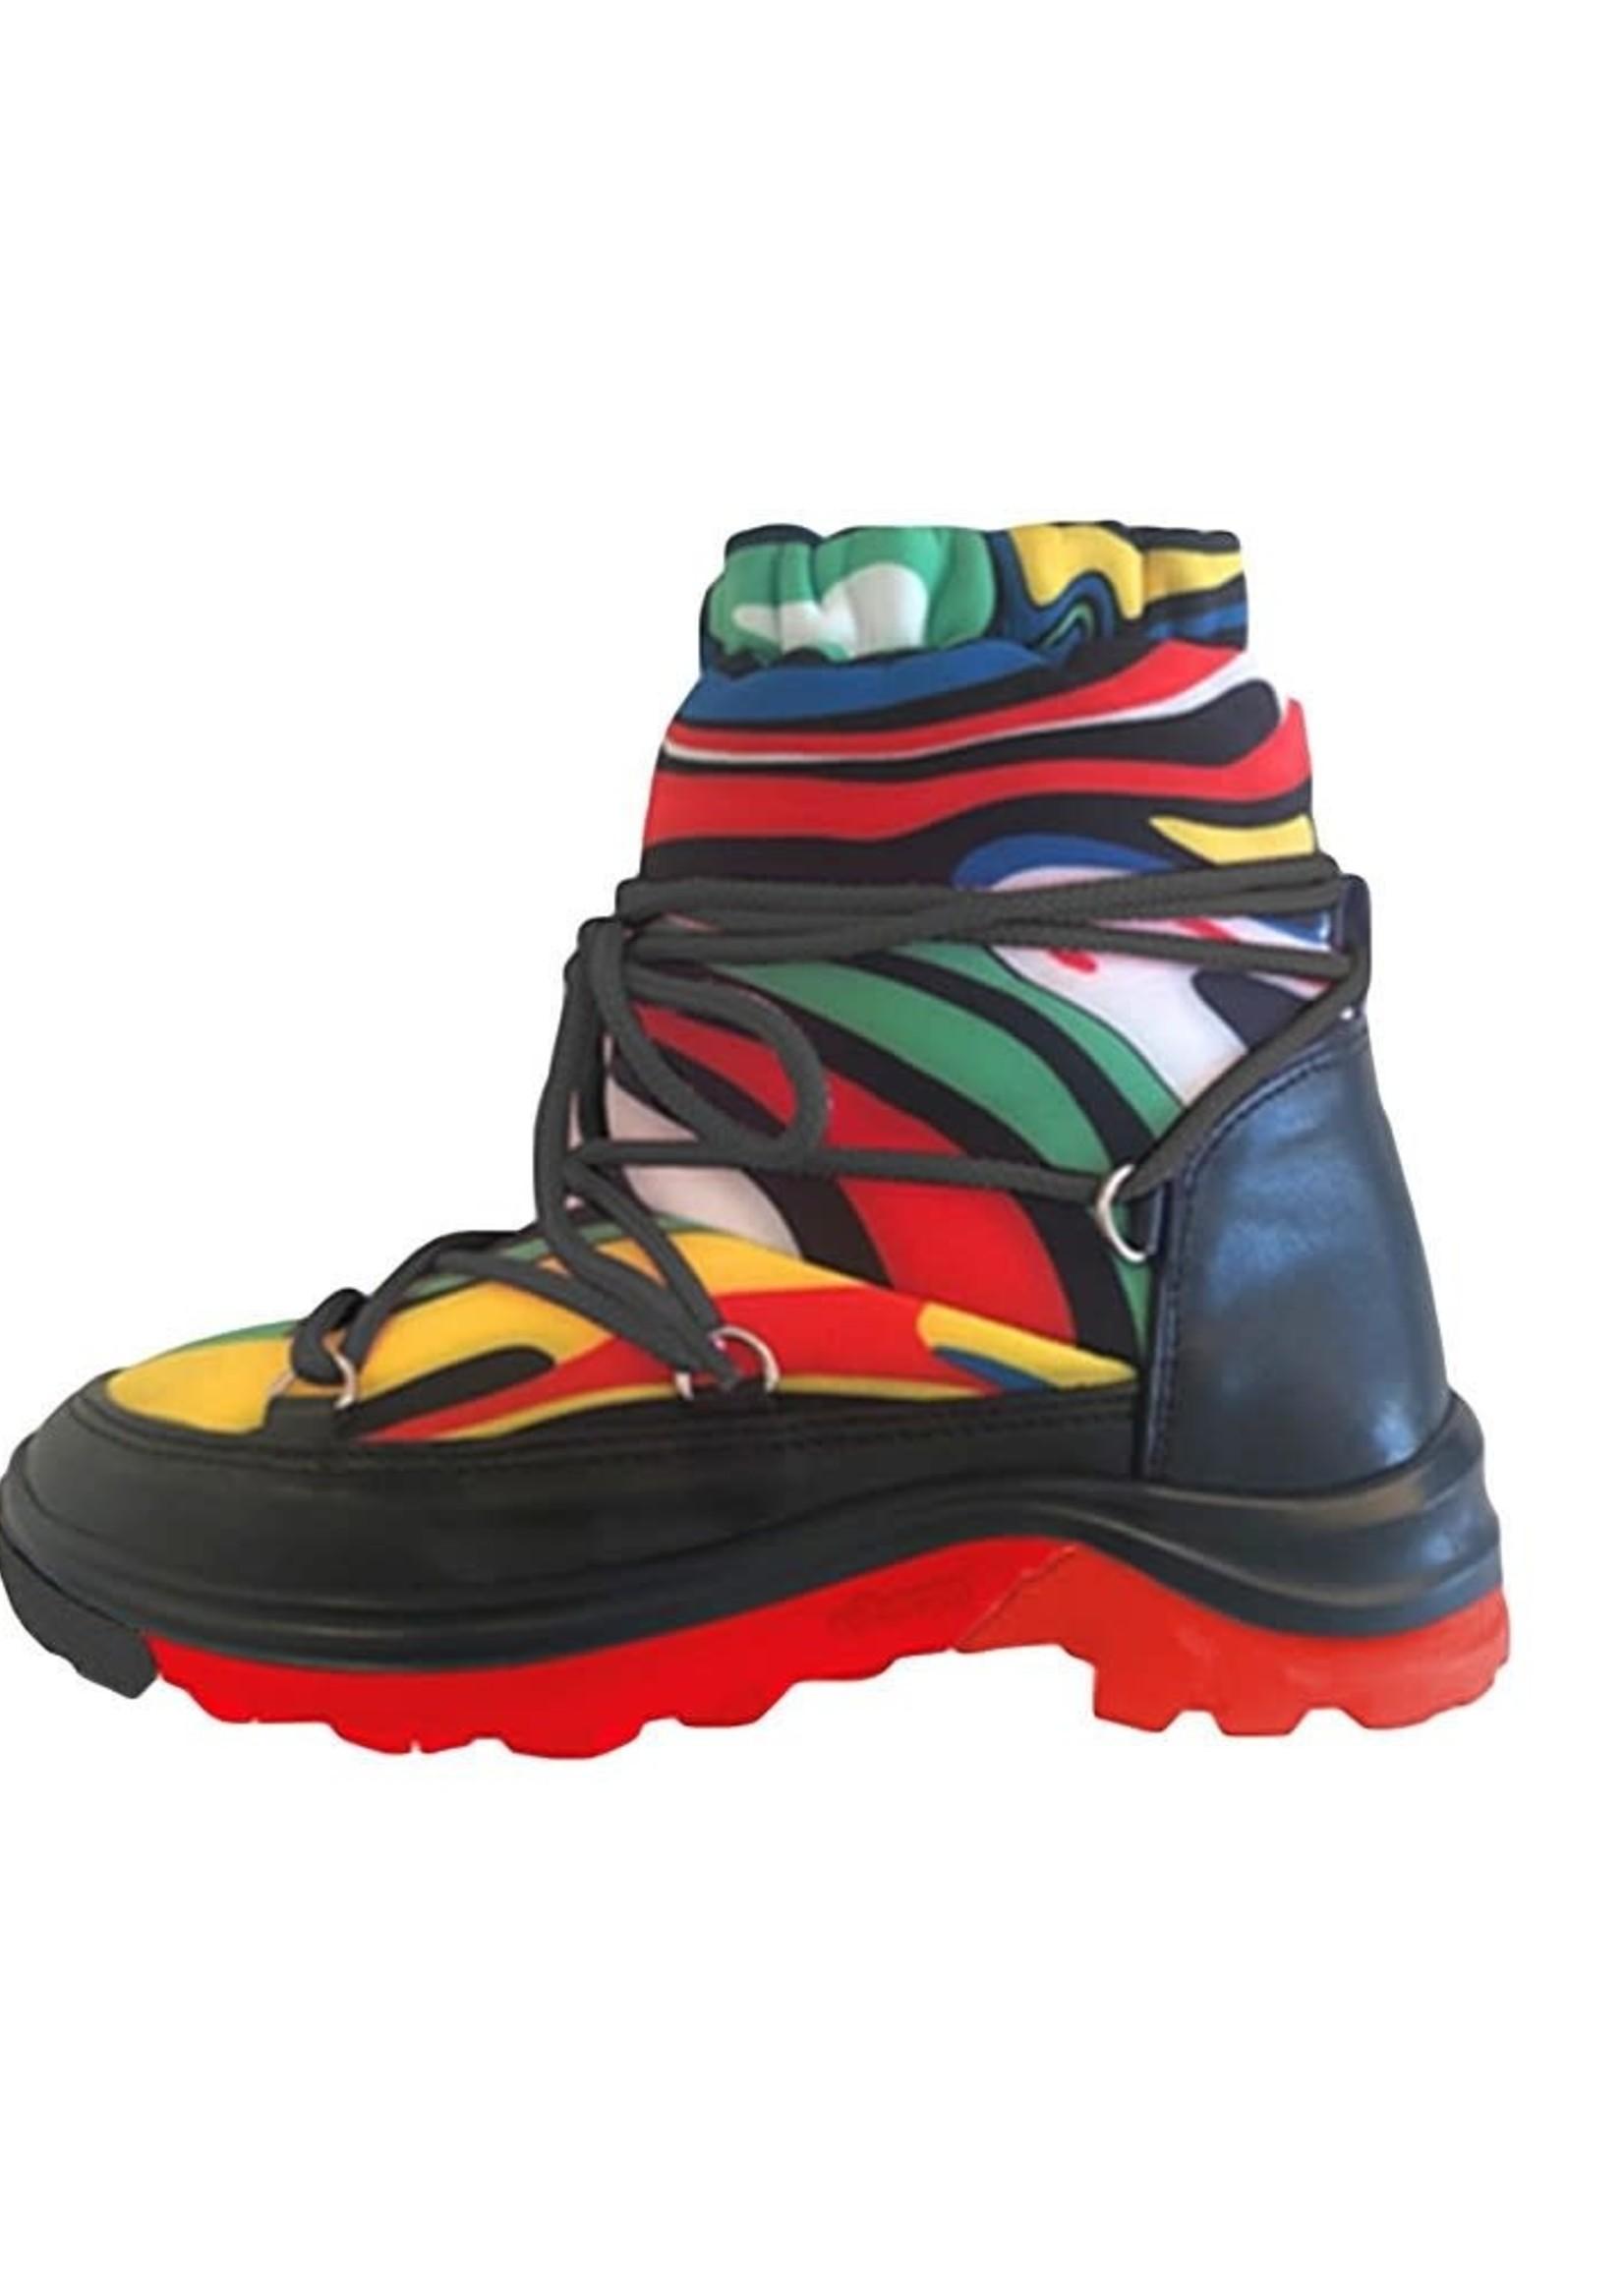 Stella McCartney Stella Mccartney-AW21 Kid Unisex Marble Snow Boots   603510 SRK10